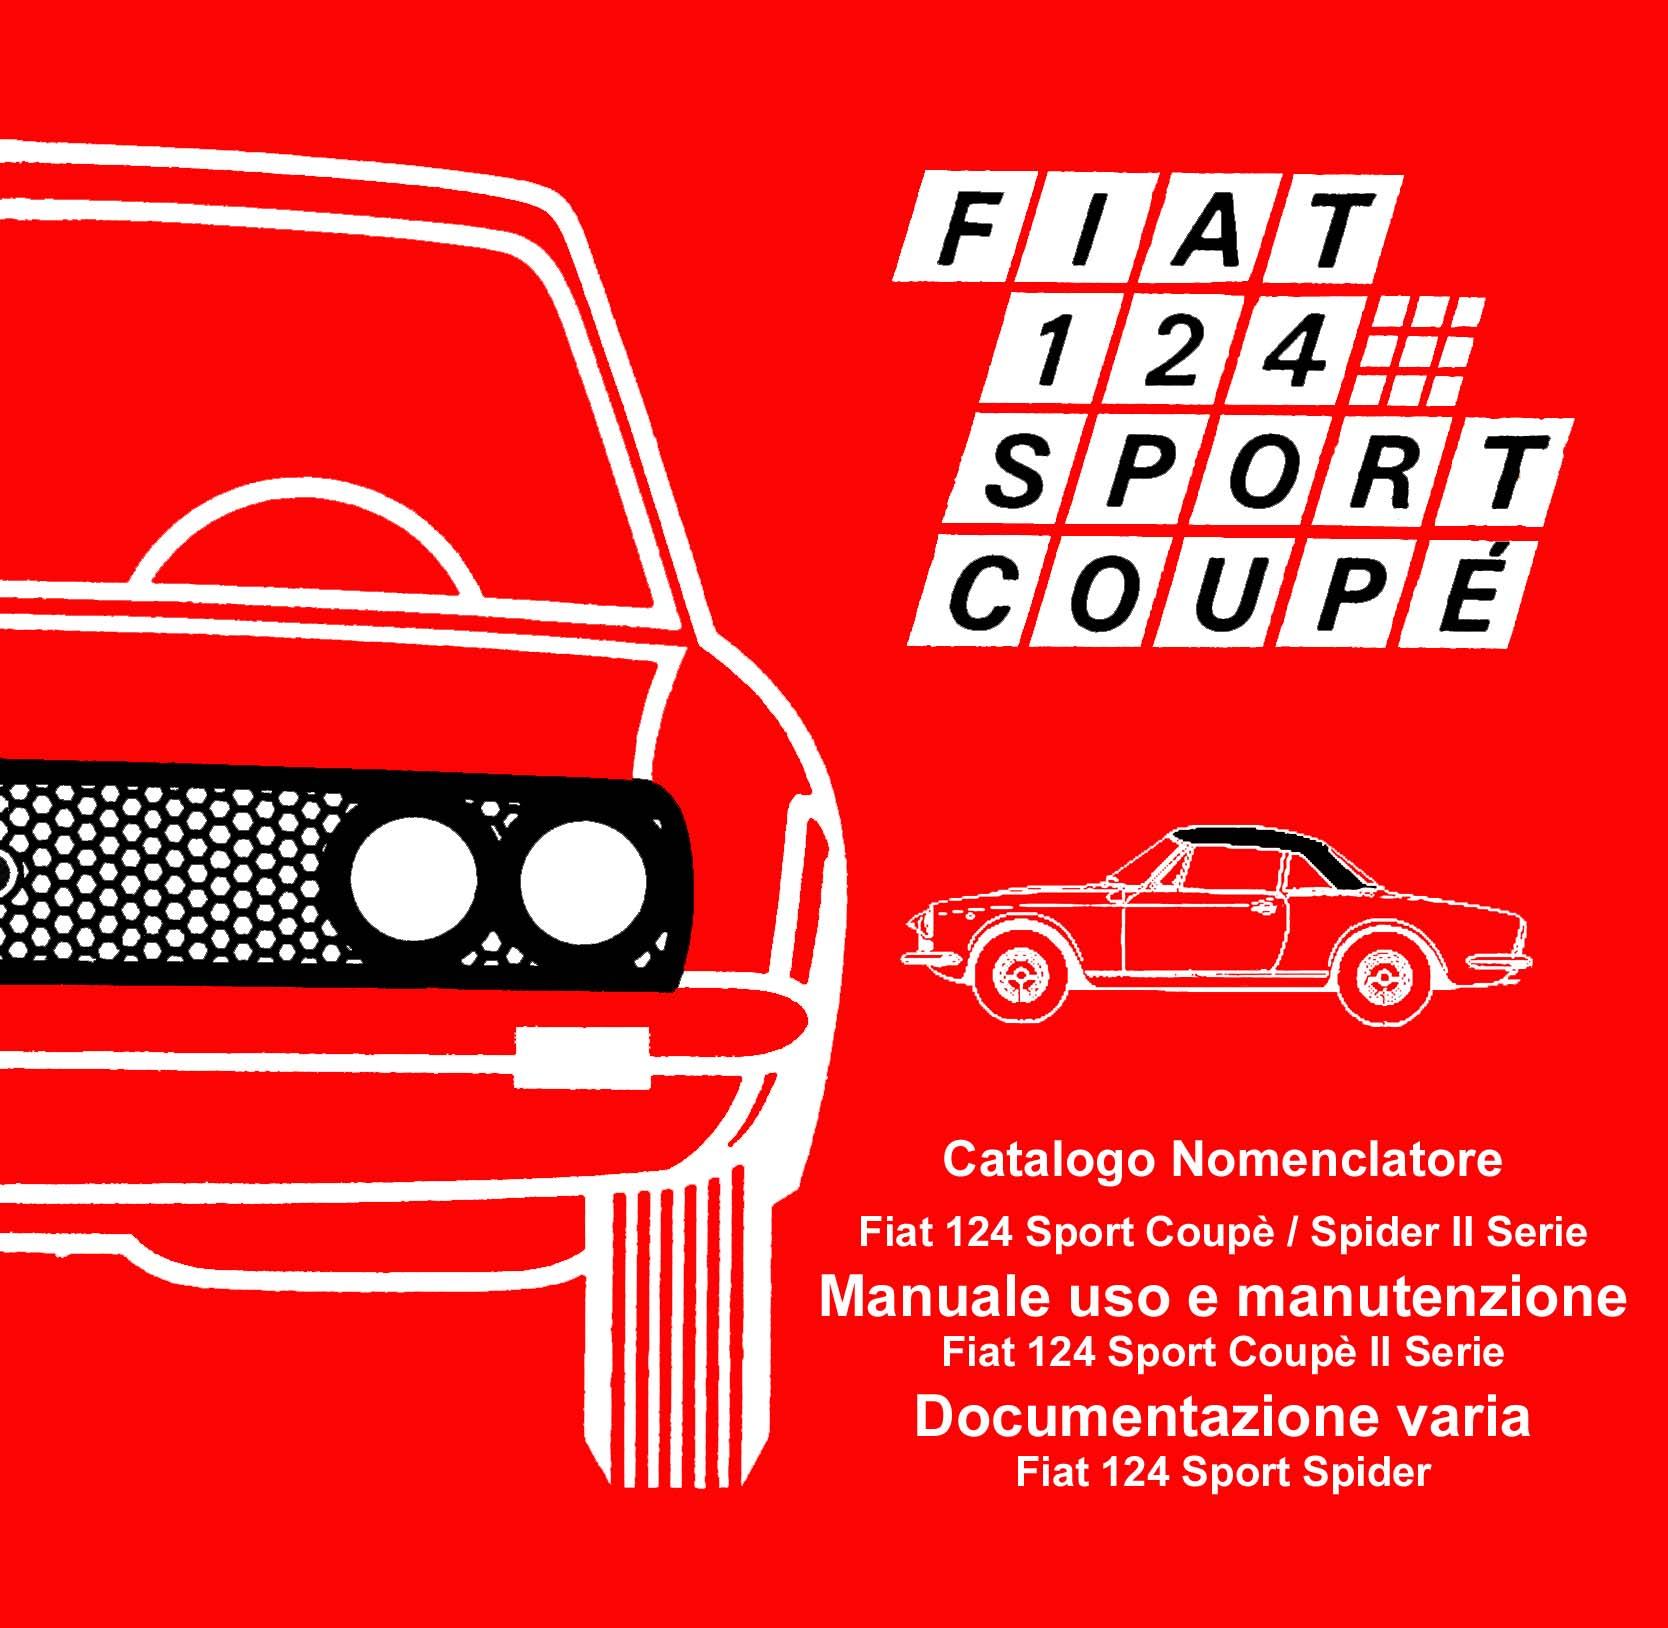 coupè prima serie Uso e manutenzione FIAT 124 Sport Coupé